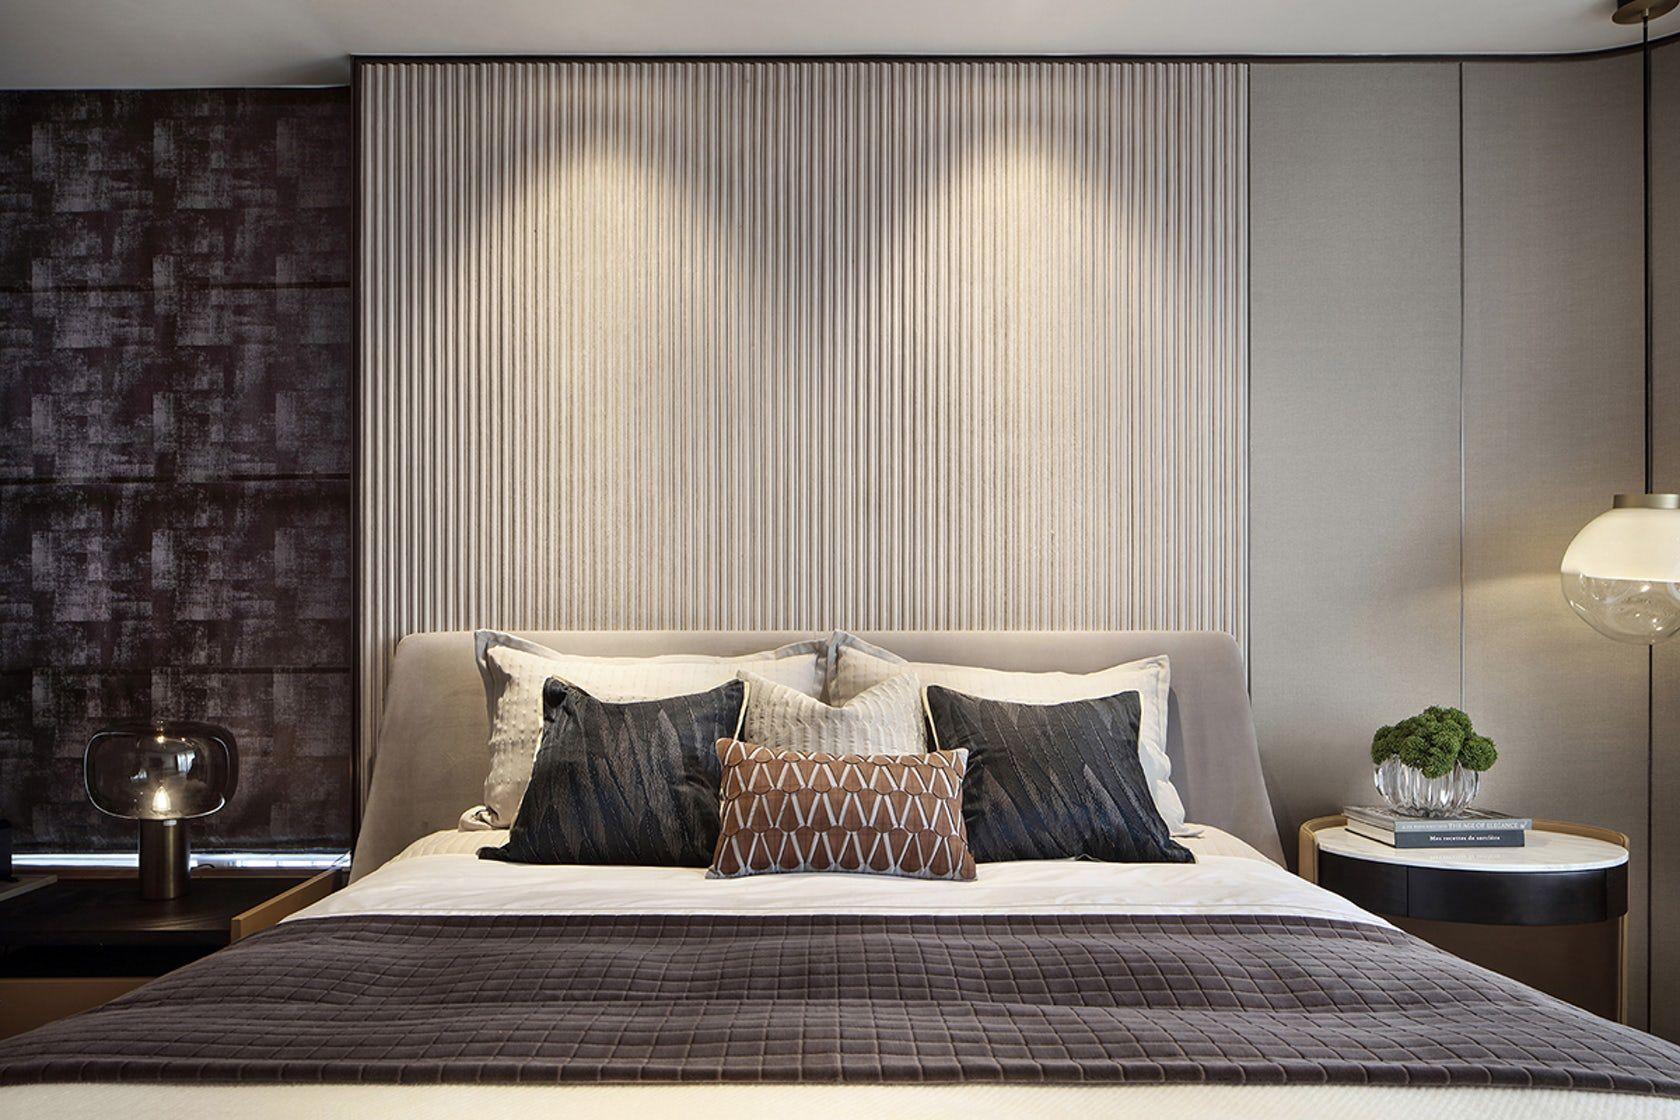 Pin by koma on 亮点 Luxury apartments, Apartment design